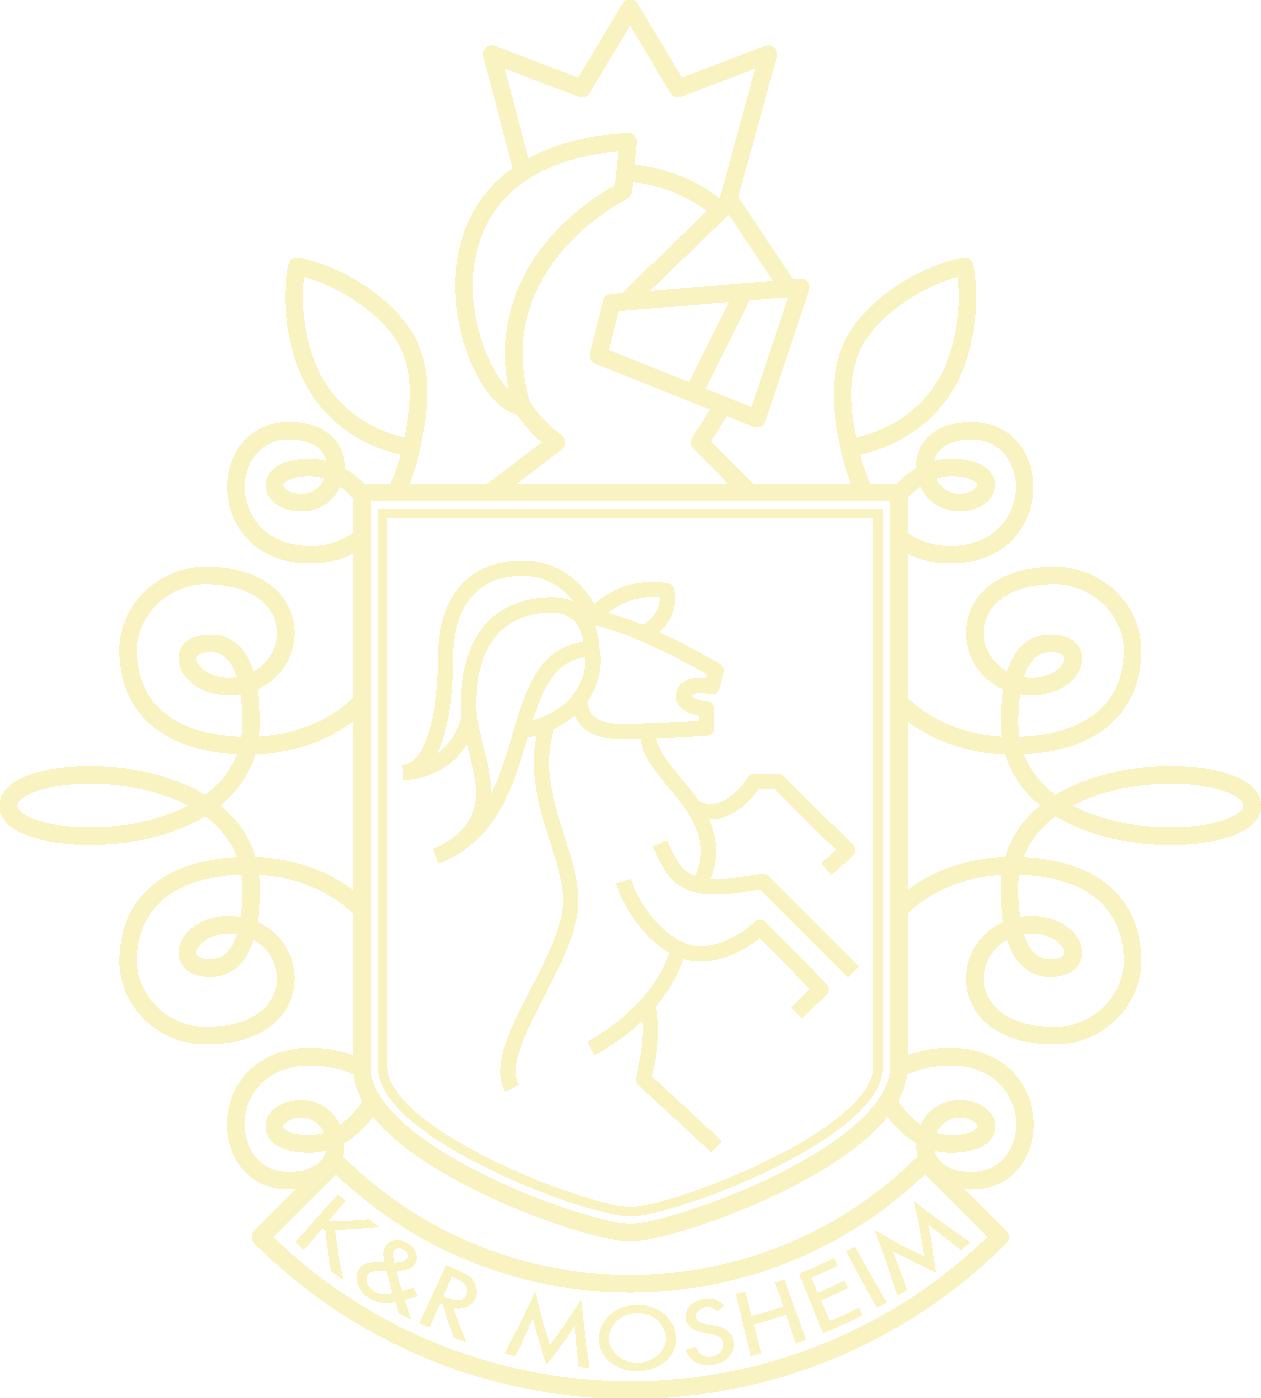 Mosheim